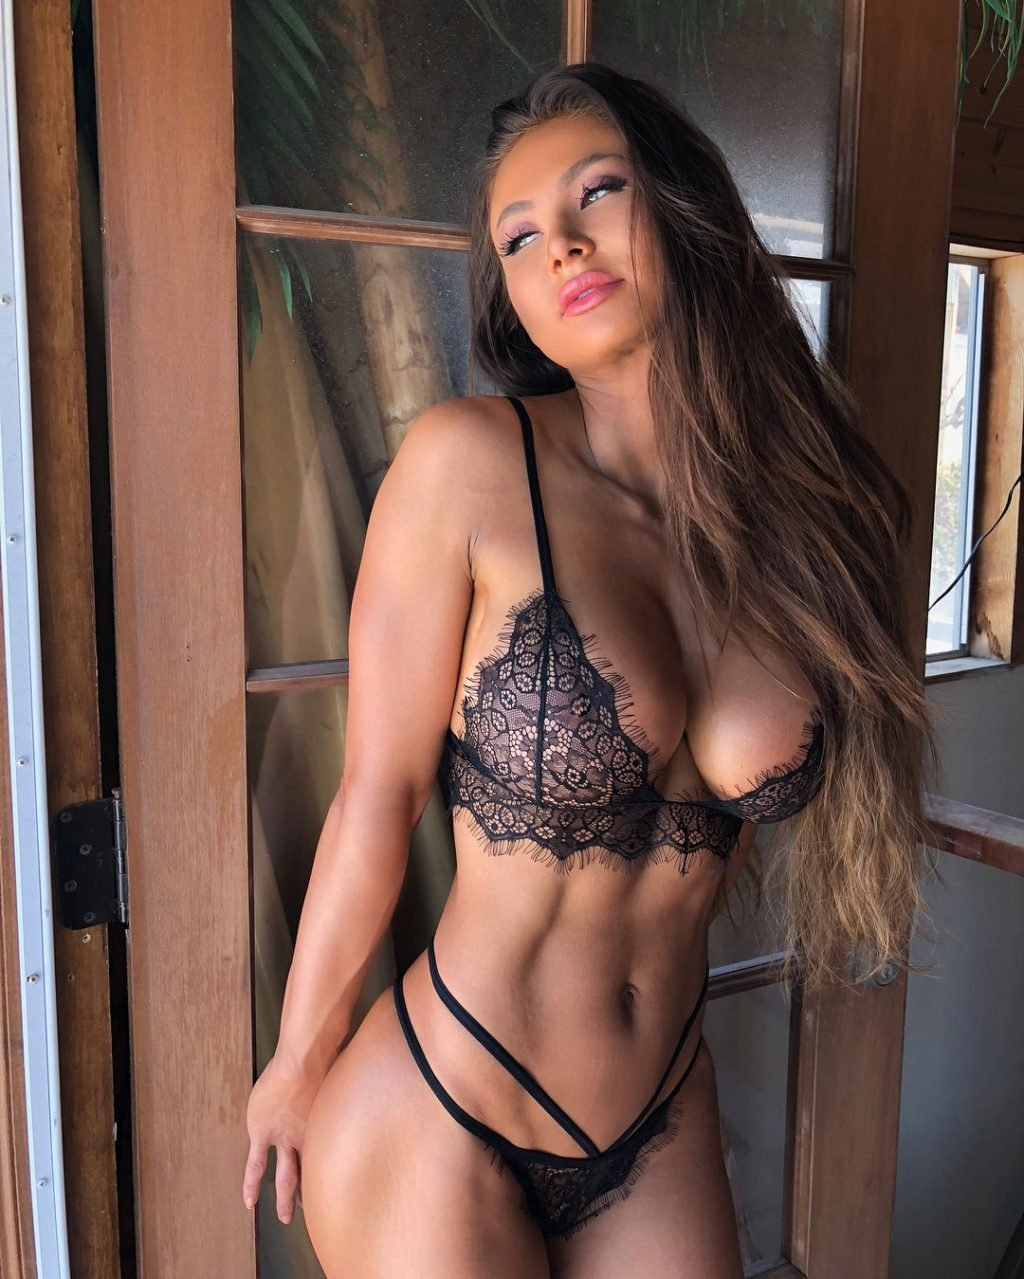 Michie Peachie Sexy nudes (17 photo), Fappening Celebrites pic